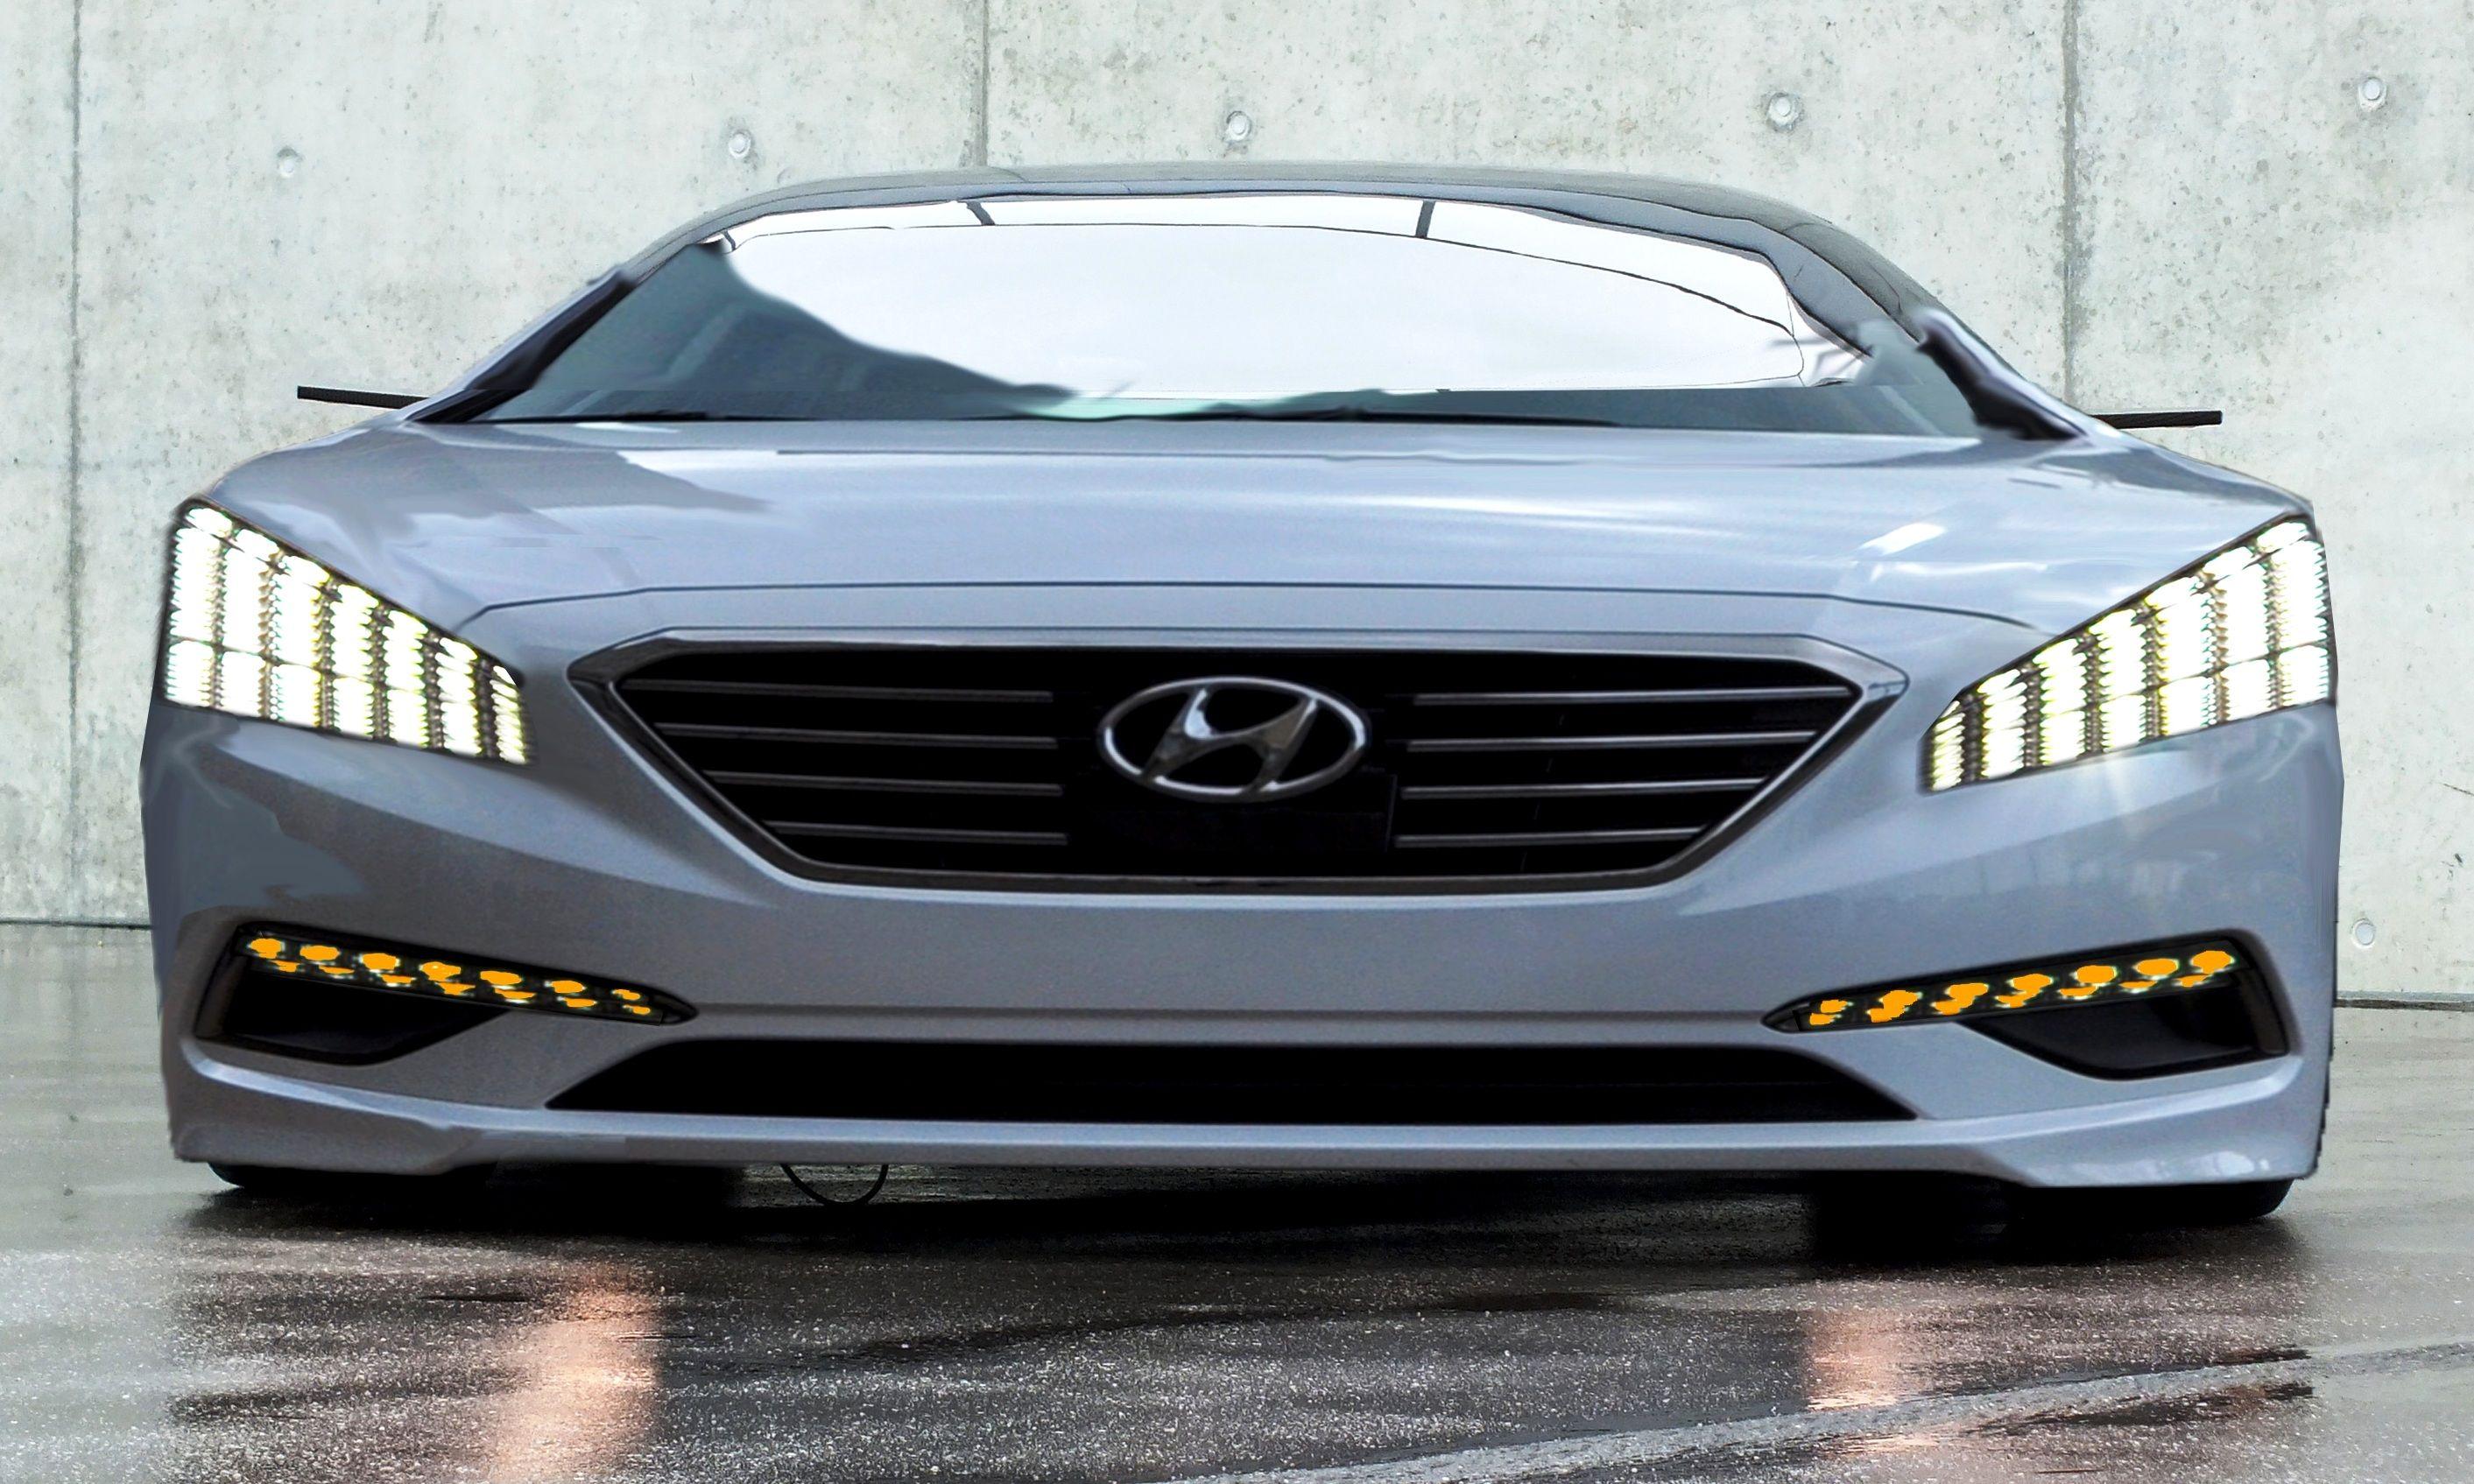 new car release datewwwNewCarReleaseDatesCom 2020 Cars 2020 New car Release Dates